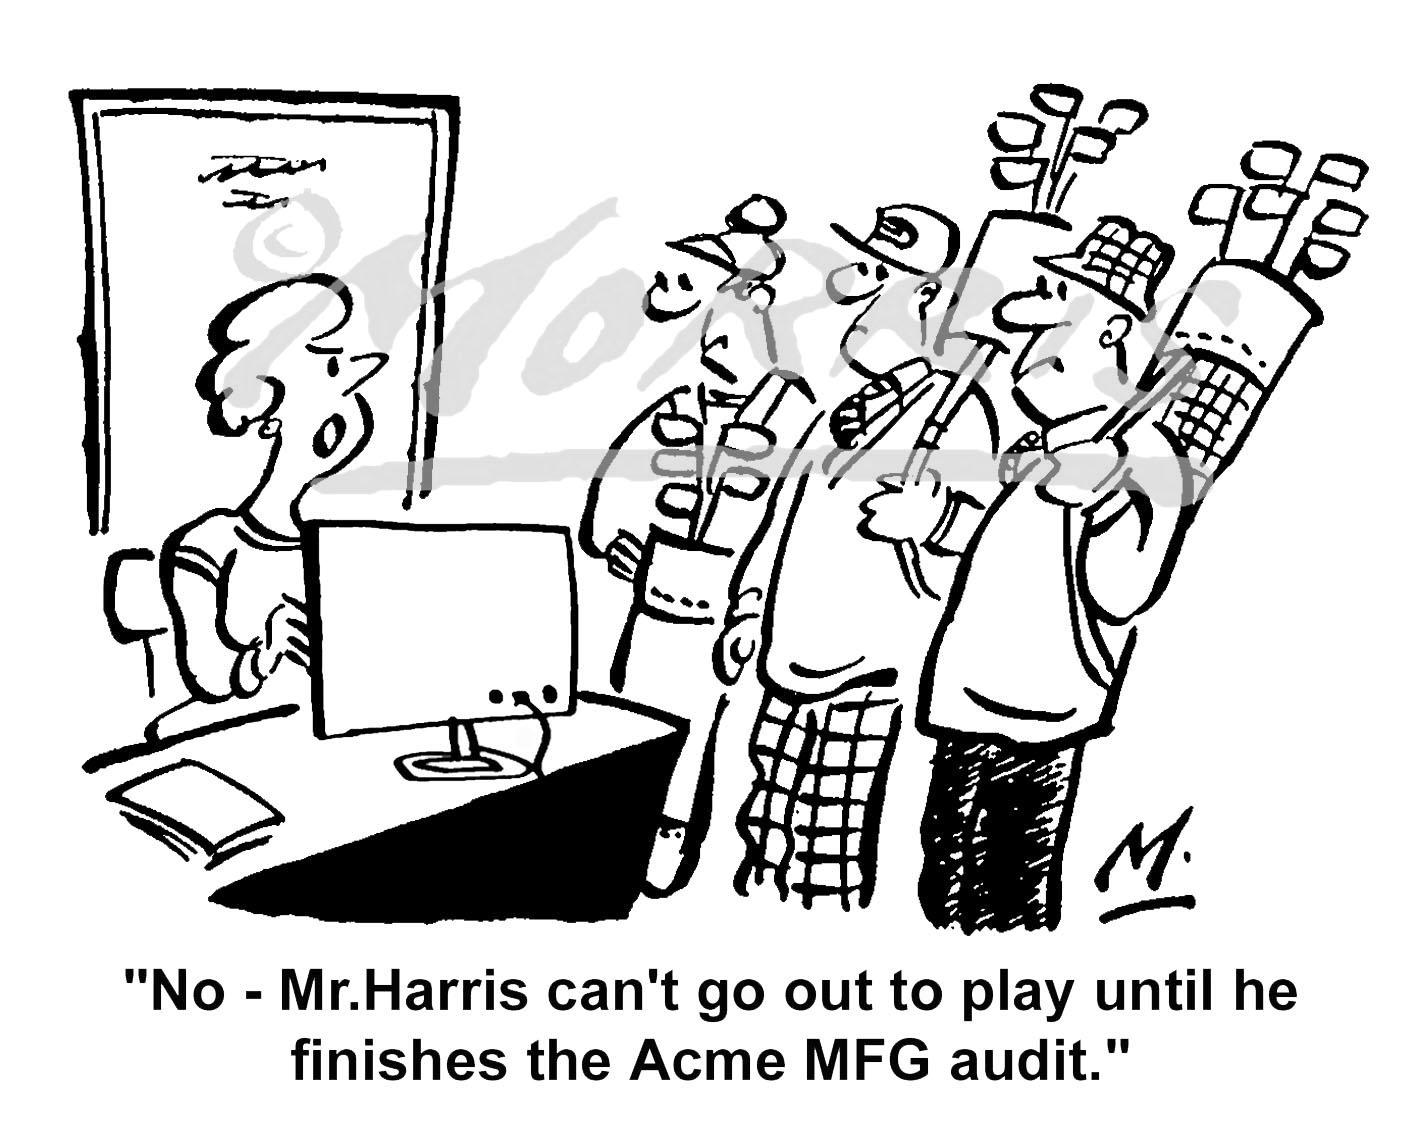 Accountants auditors golf comic cartoons Ref: 1275bw